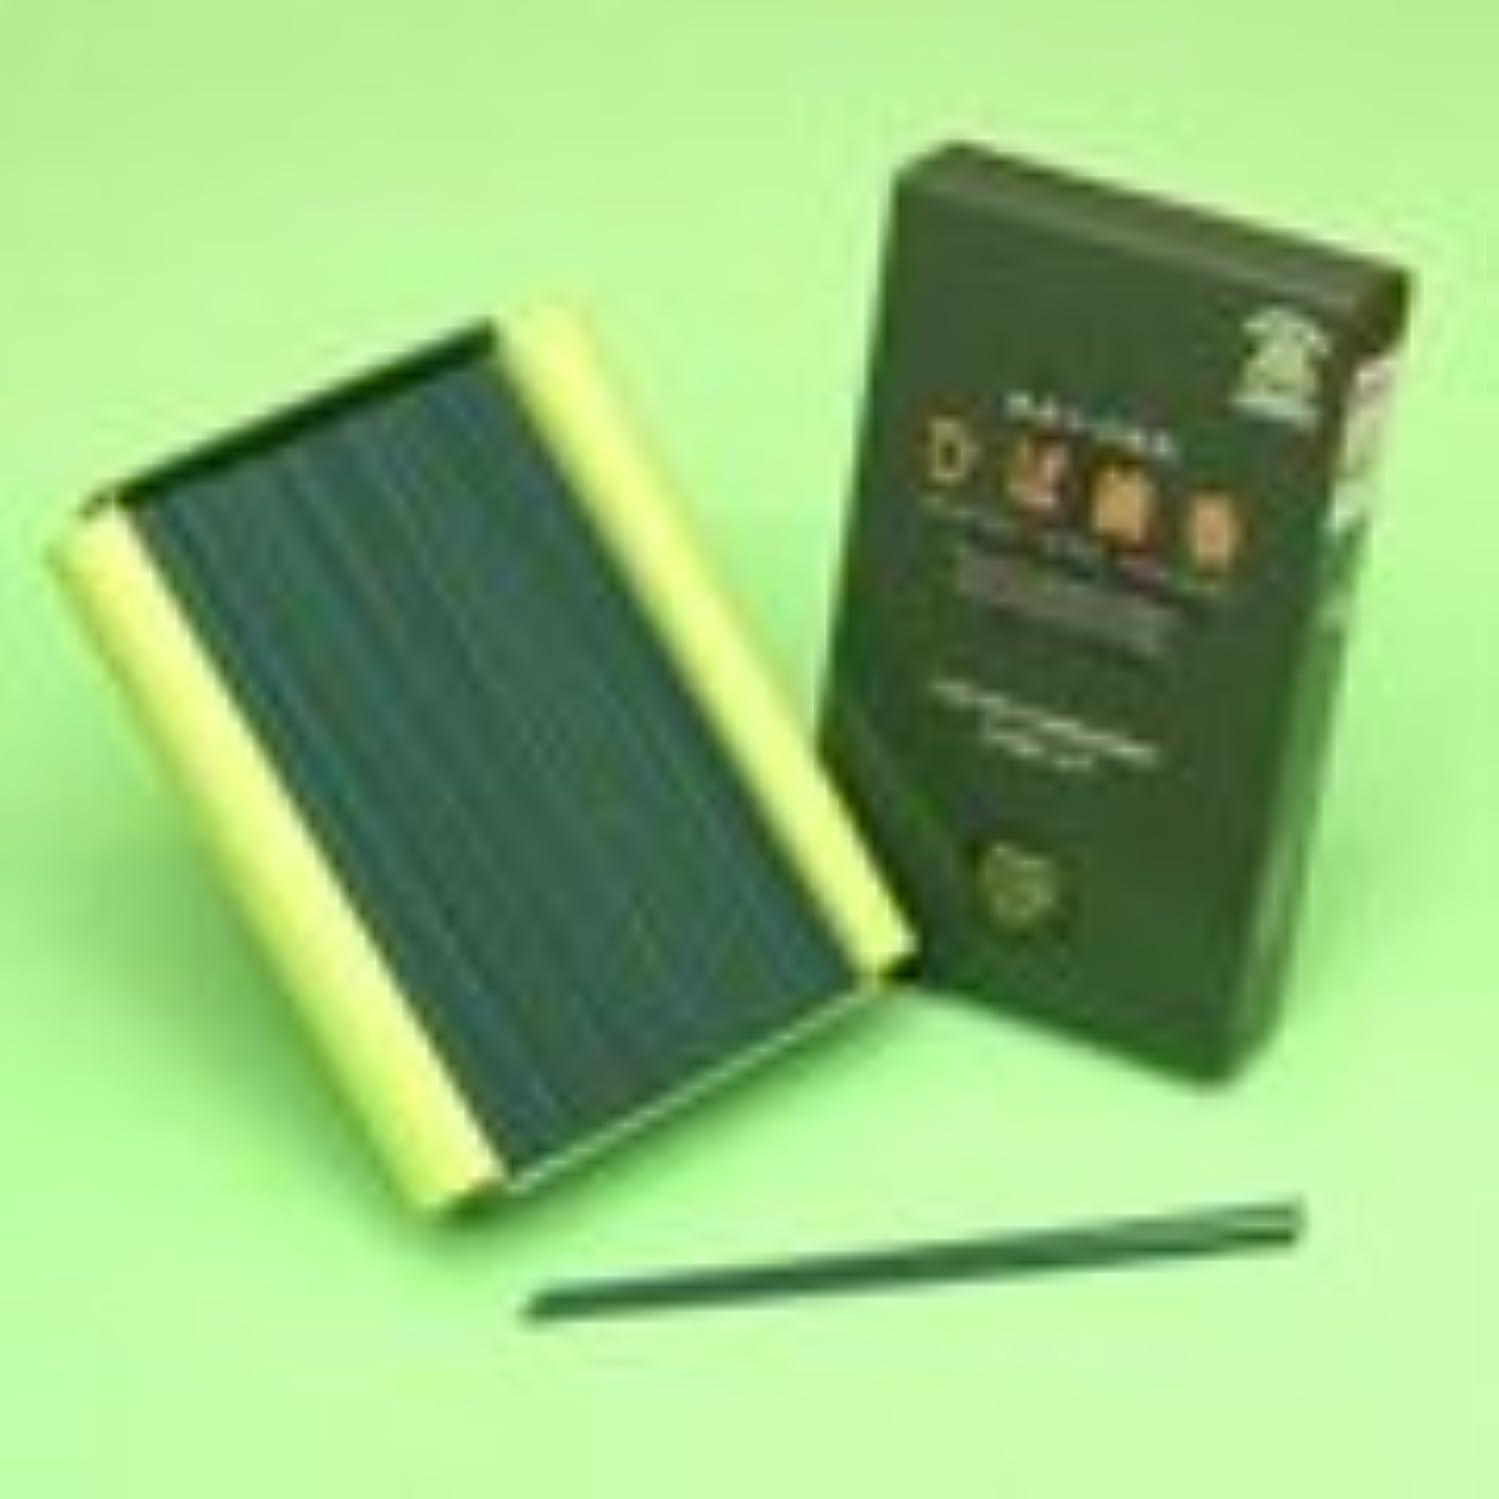 破産物質高度な青森ひば線香 香煙 緑箱